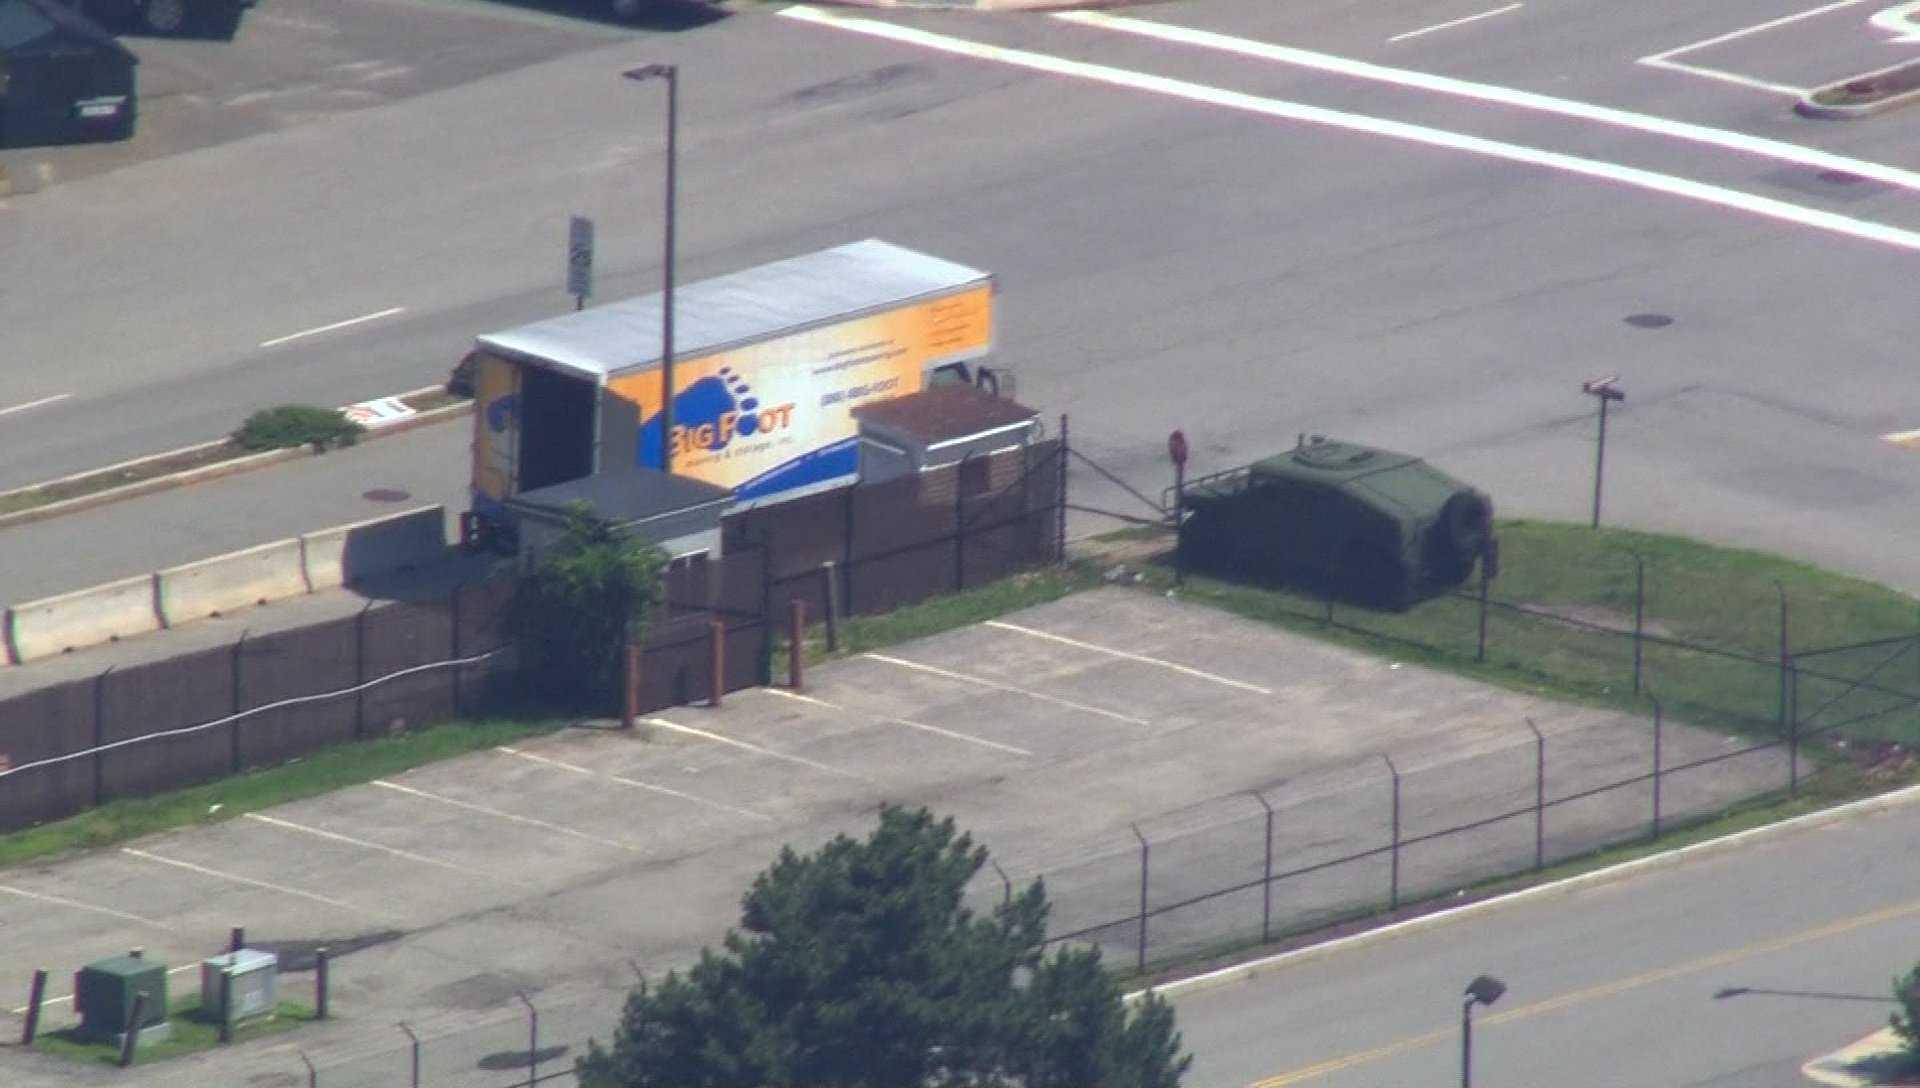 Suspicious Truck Prompts Bomb Squad Response At Hanscom Air Force Base